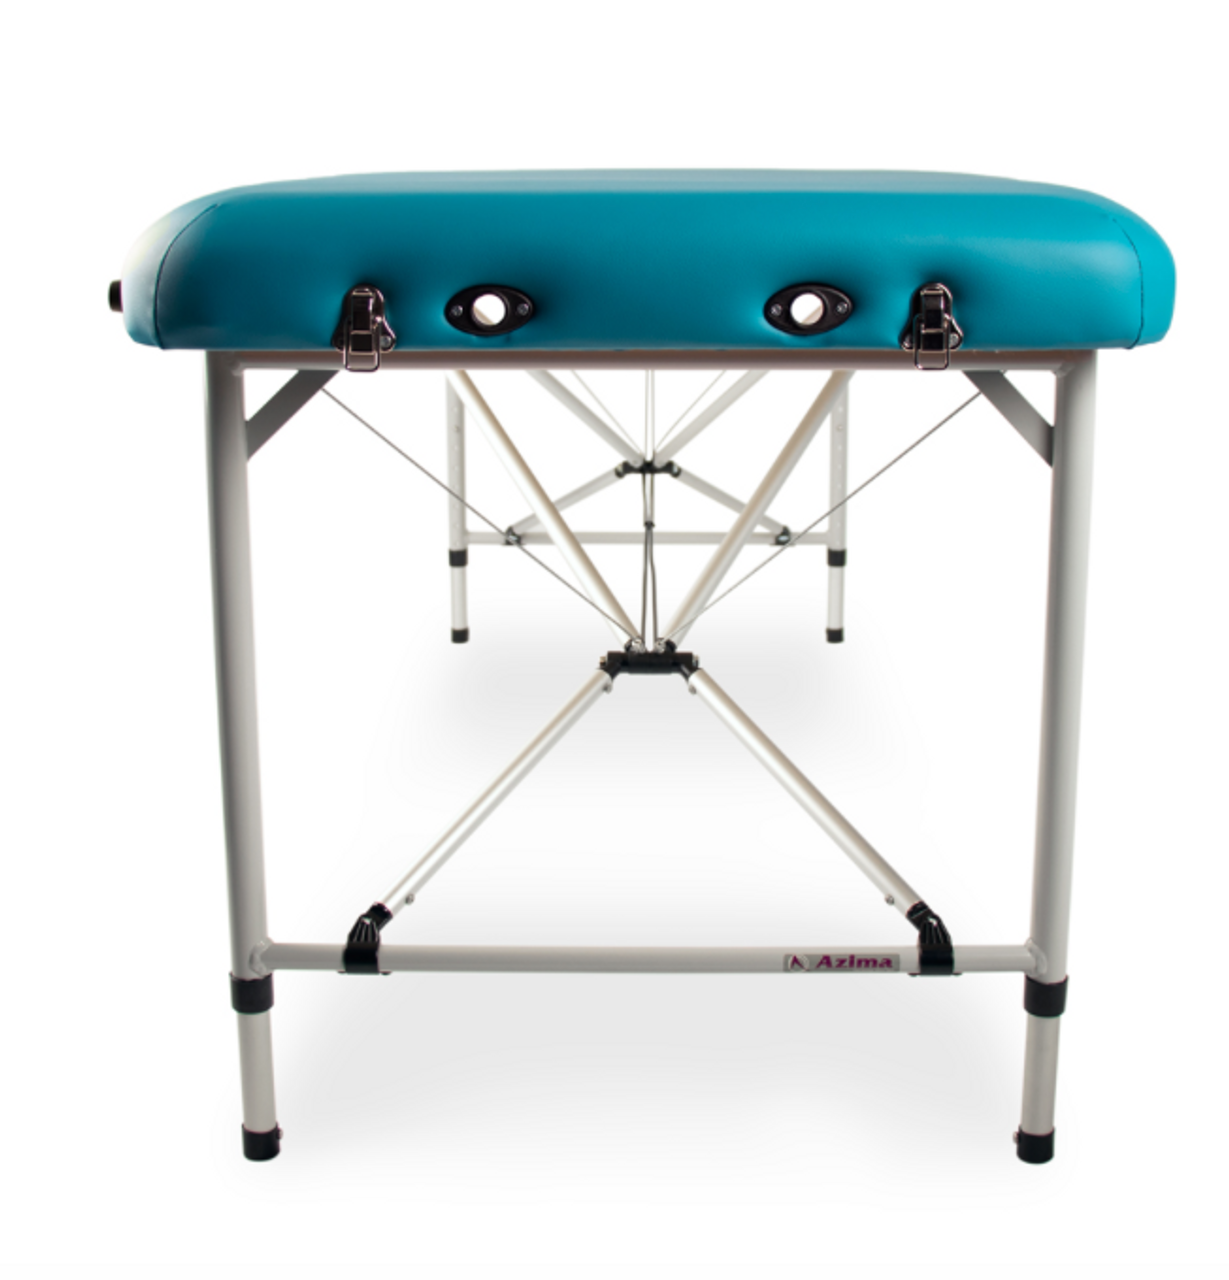 Huna Magic Portable Table